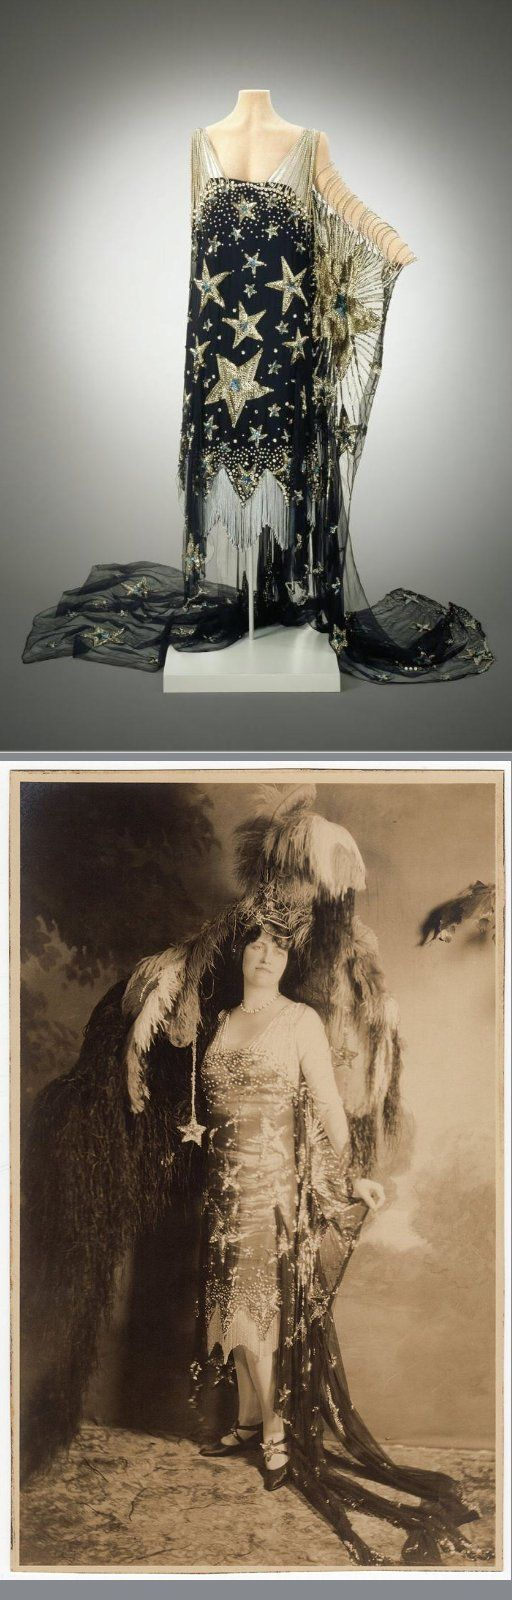 Silk crêpe starry night costume worn by Marjorie Merriweather Post at the Everglades, circa 1920s